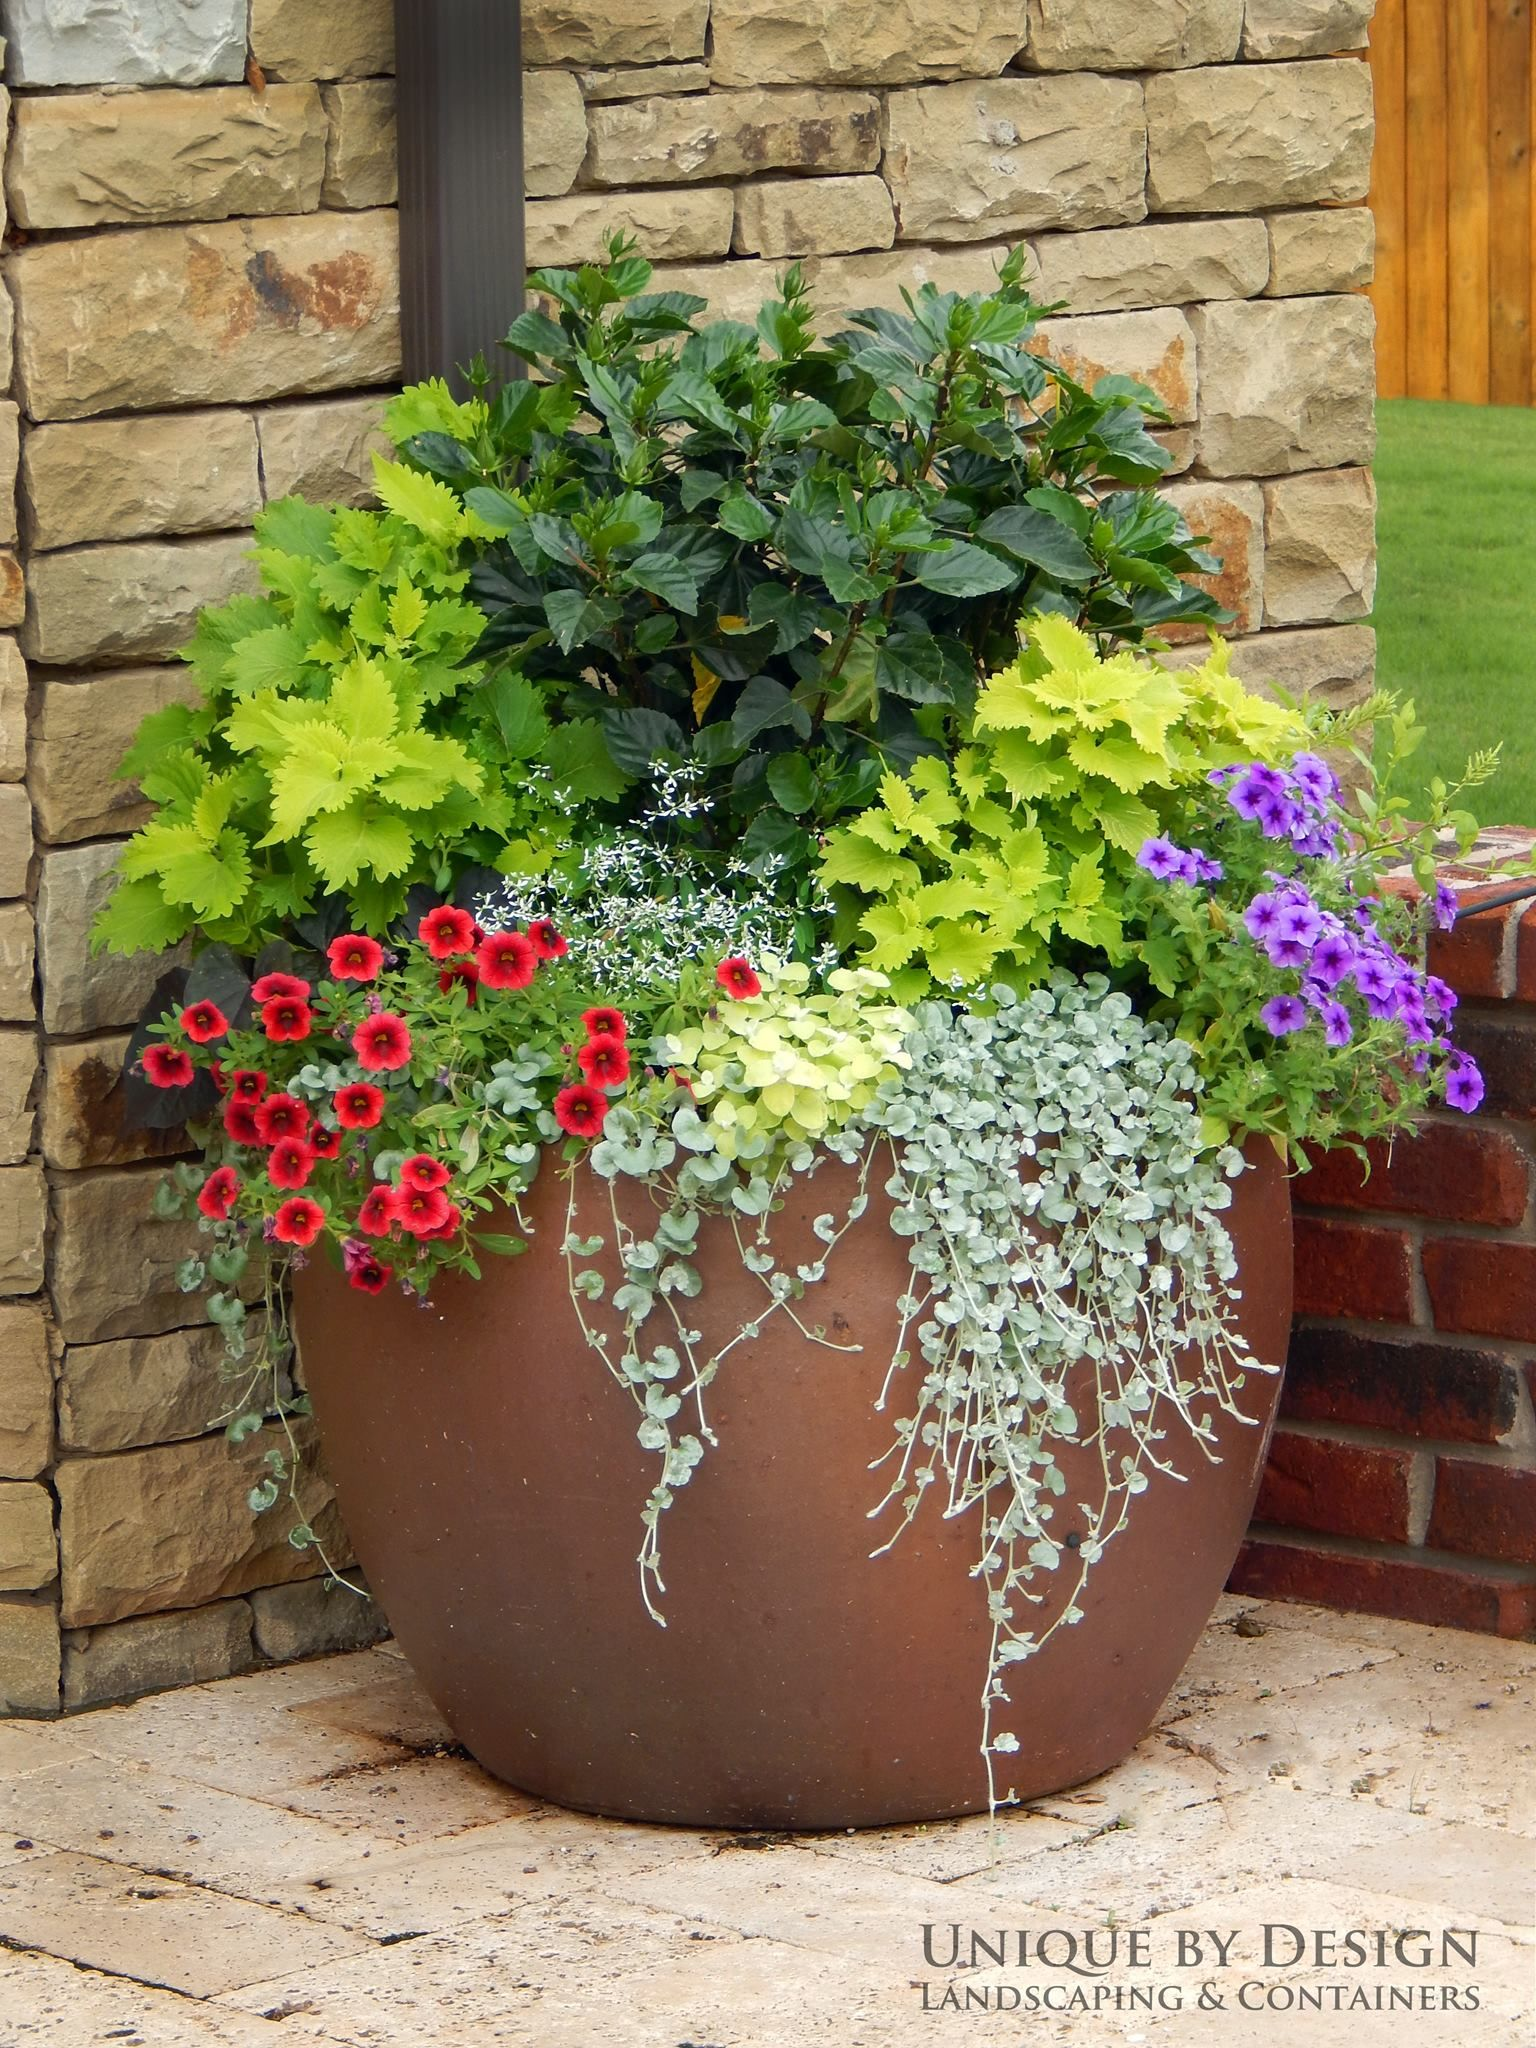 Garten container haus dekoration - Container garten ...